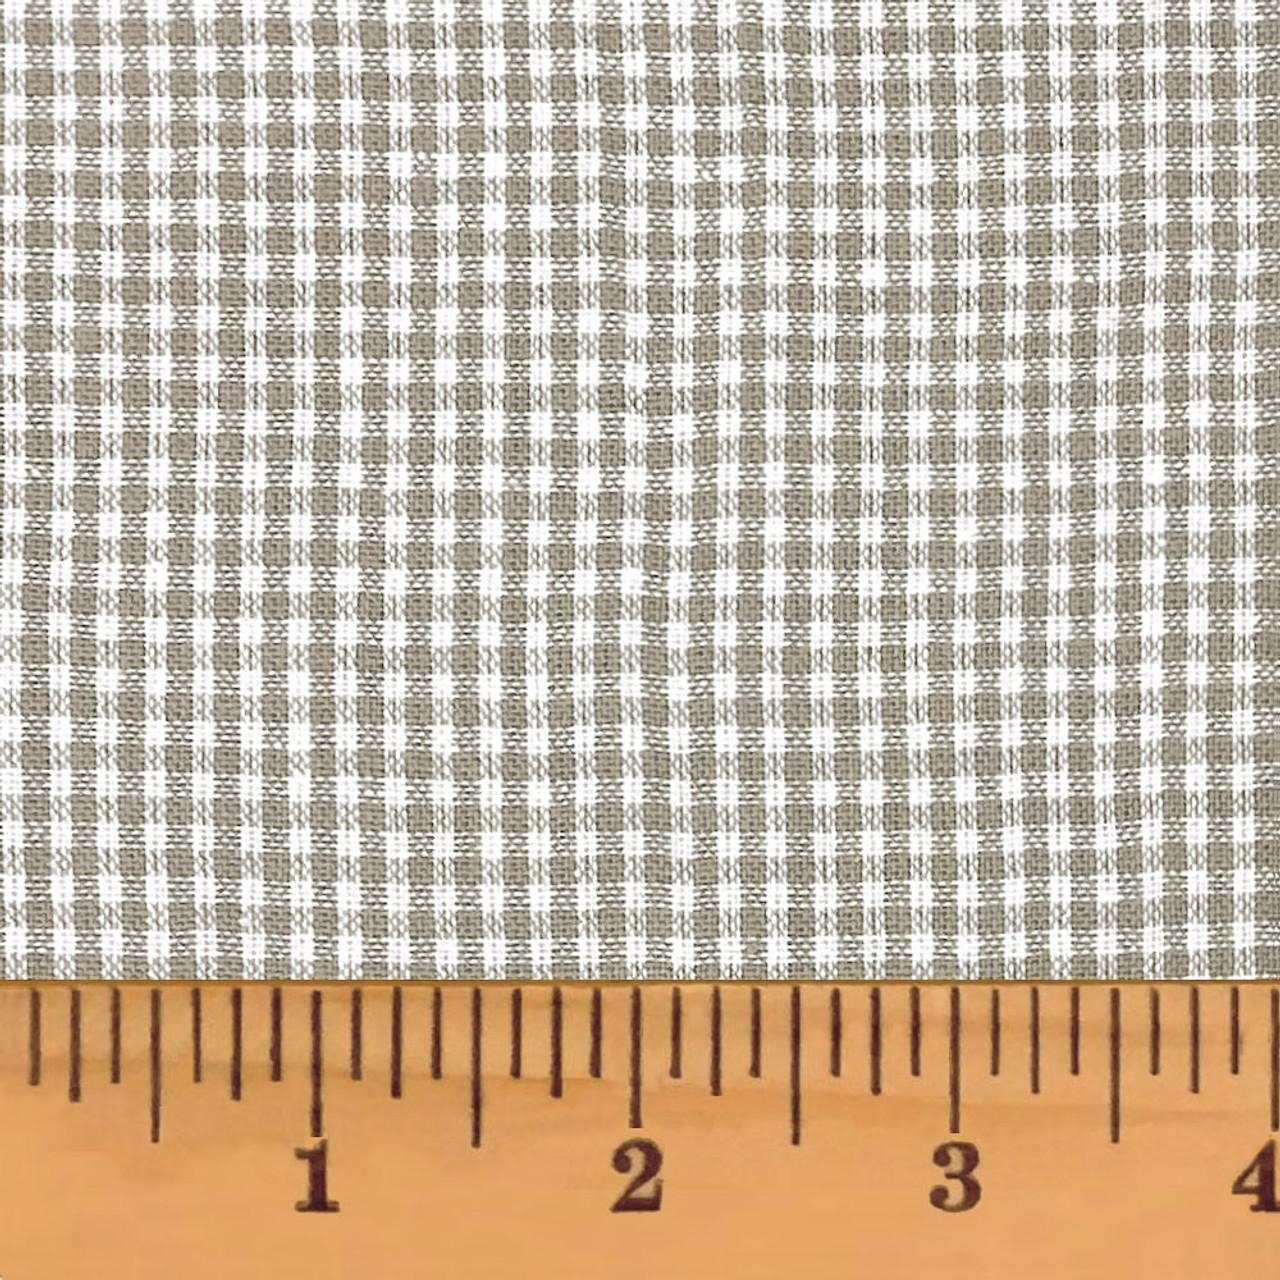 Magnolia Gray 2 Homespun Cotton Fabric